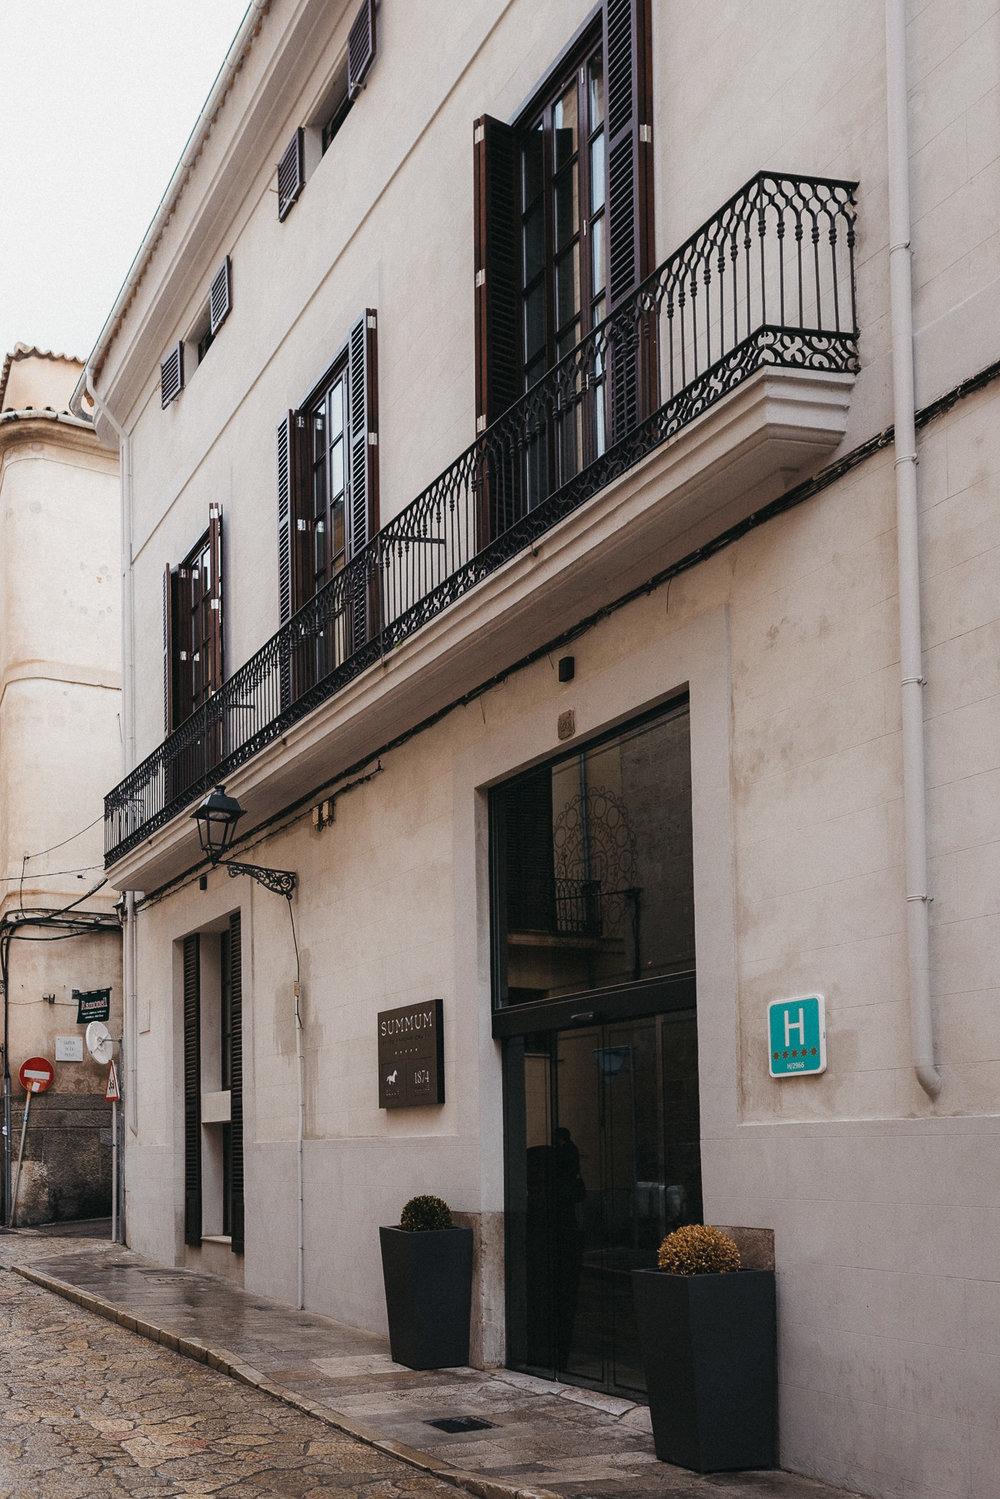 Fototagebuch_Mallorca_180324_001.jpg